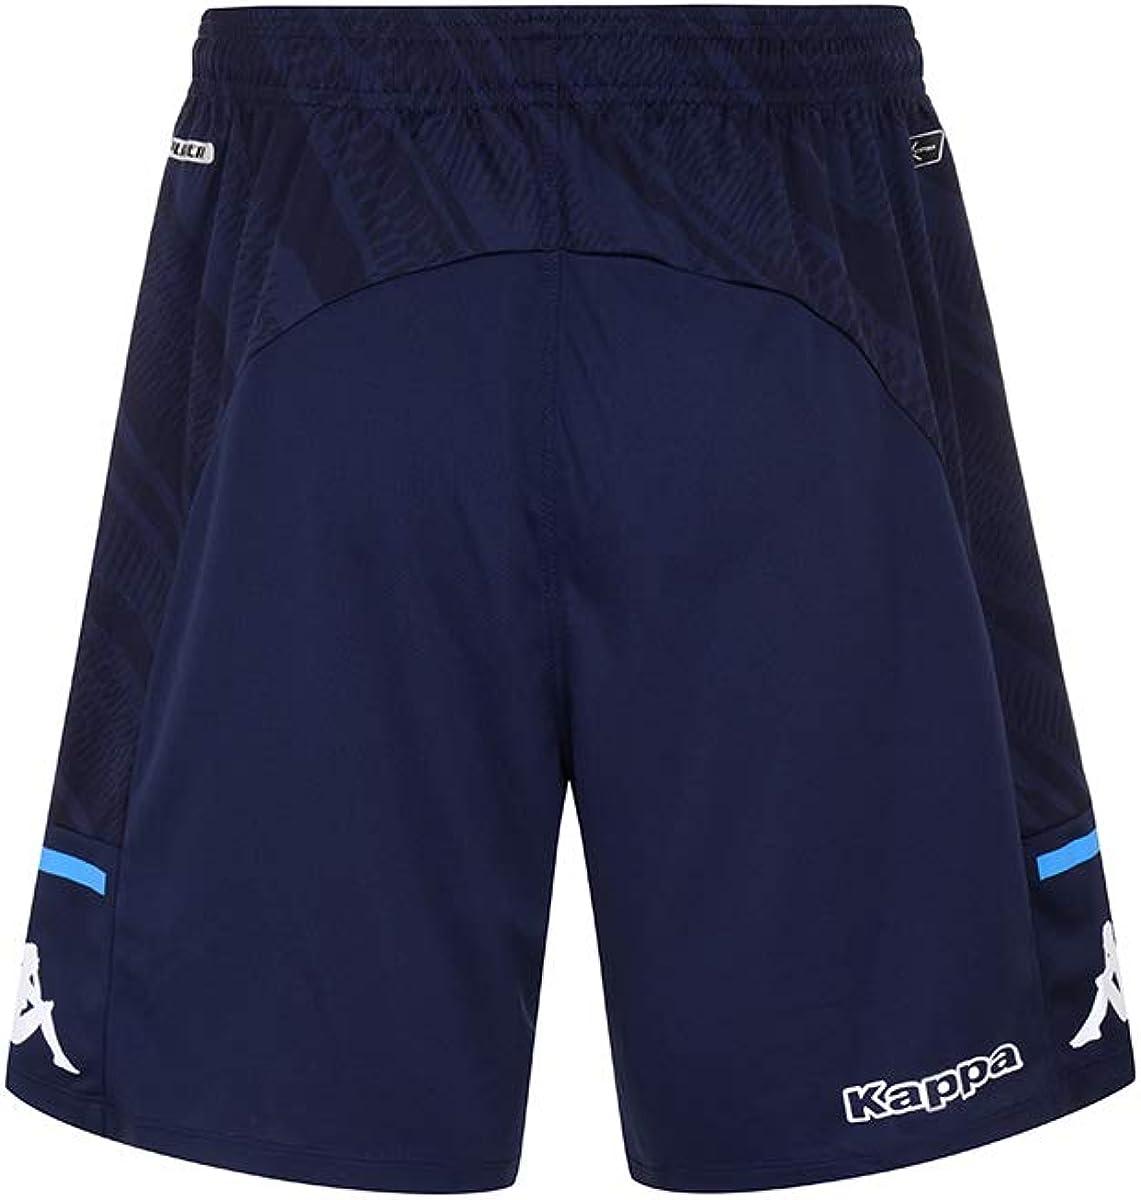 2020-2021 Napoli Training Shorts Navy